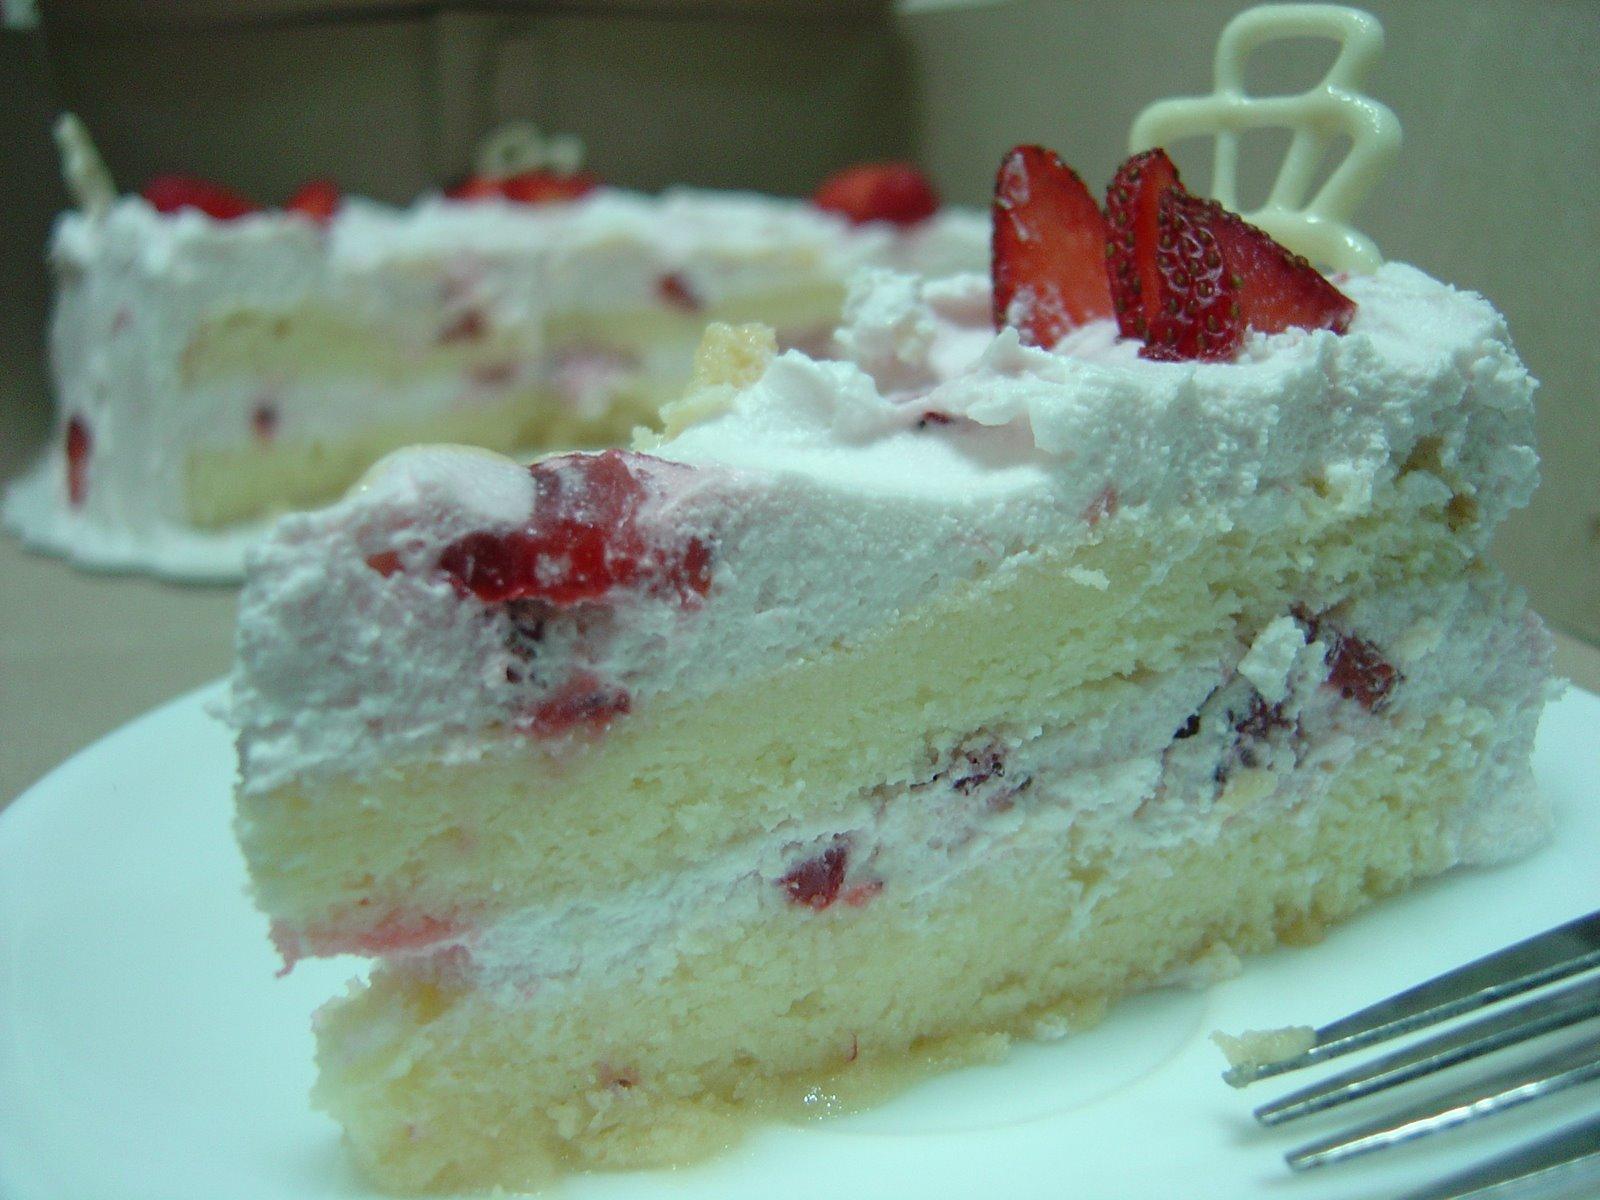 [Strawberry+petals1.JPG]